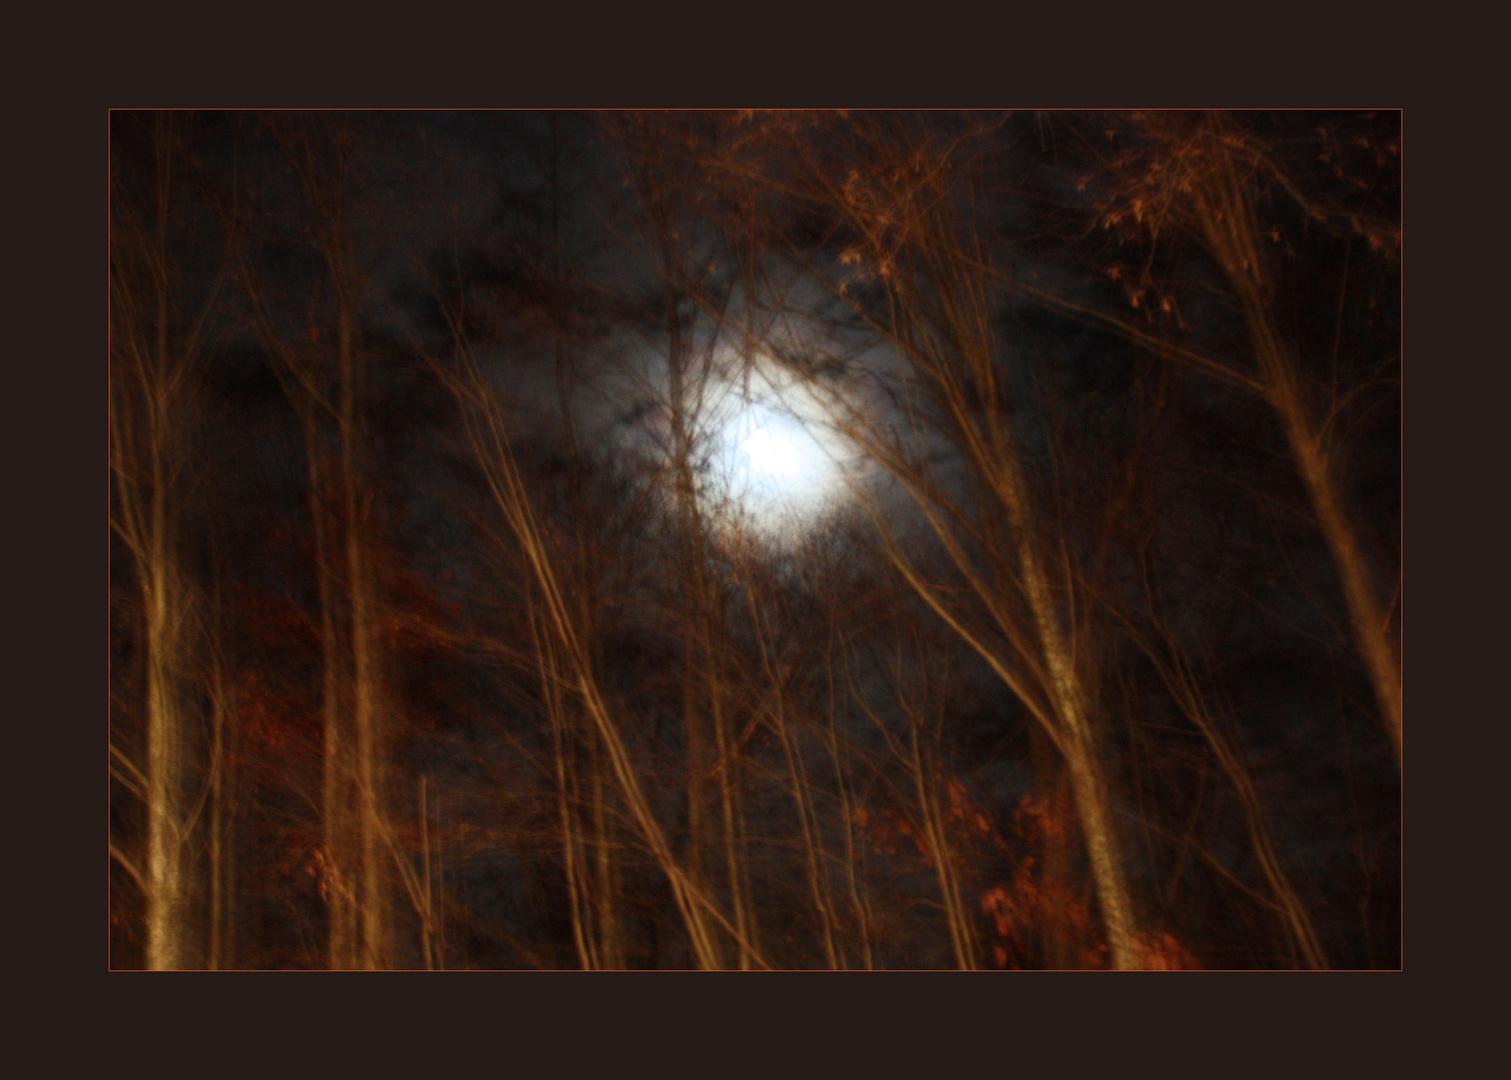 A Foggy Moonlit Night